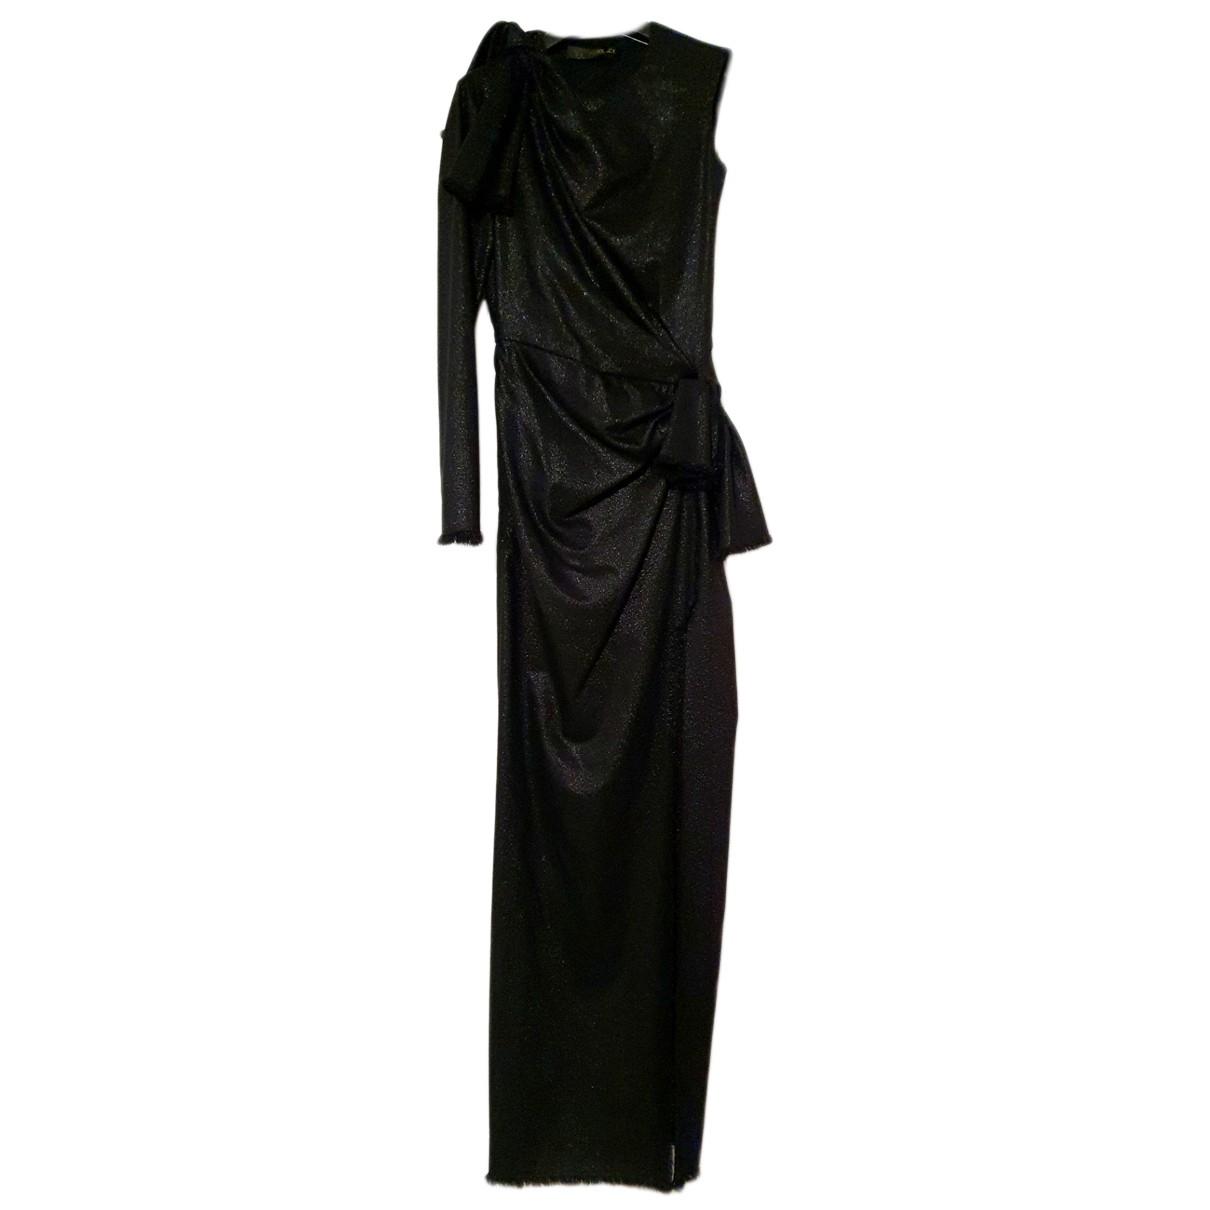 Versace N Black Wool Dress for Women